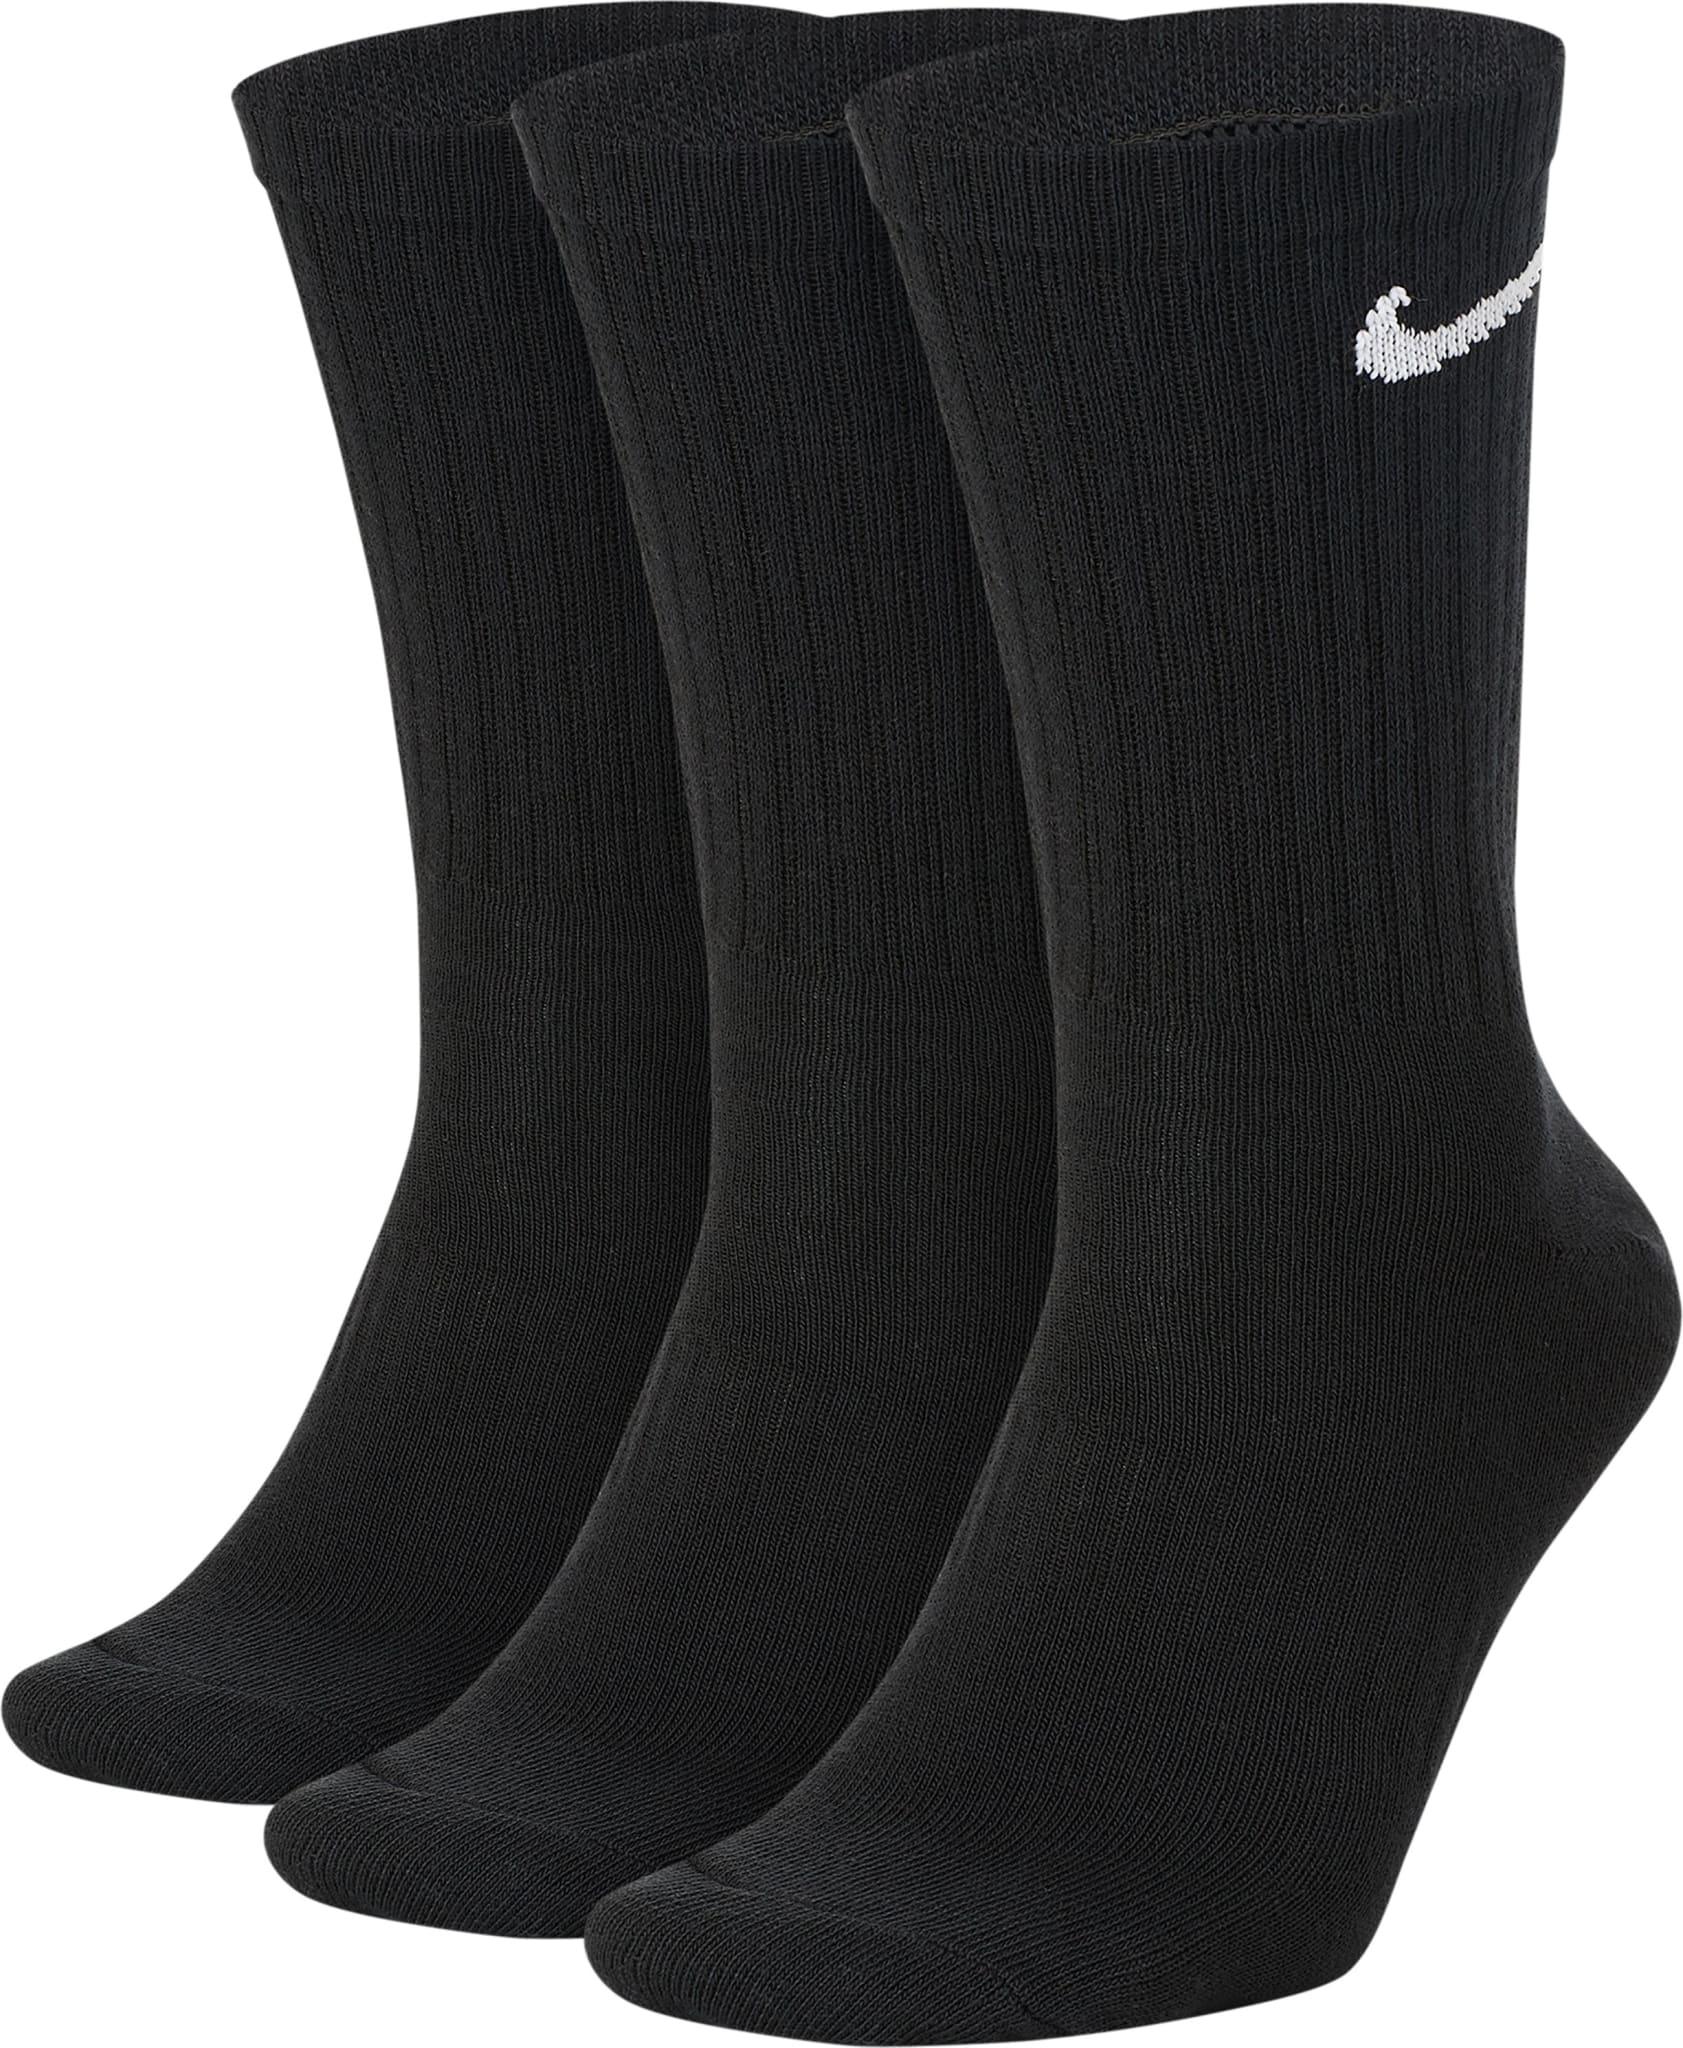 Nike Everyday Lightweight 3-Pack Training Socks